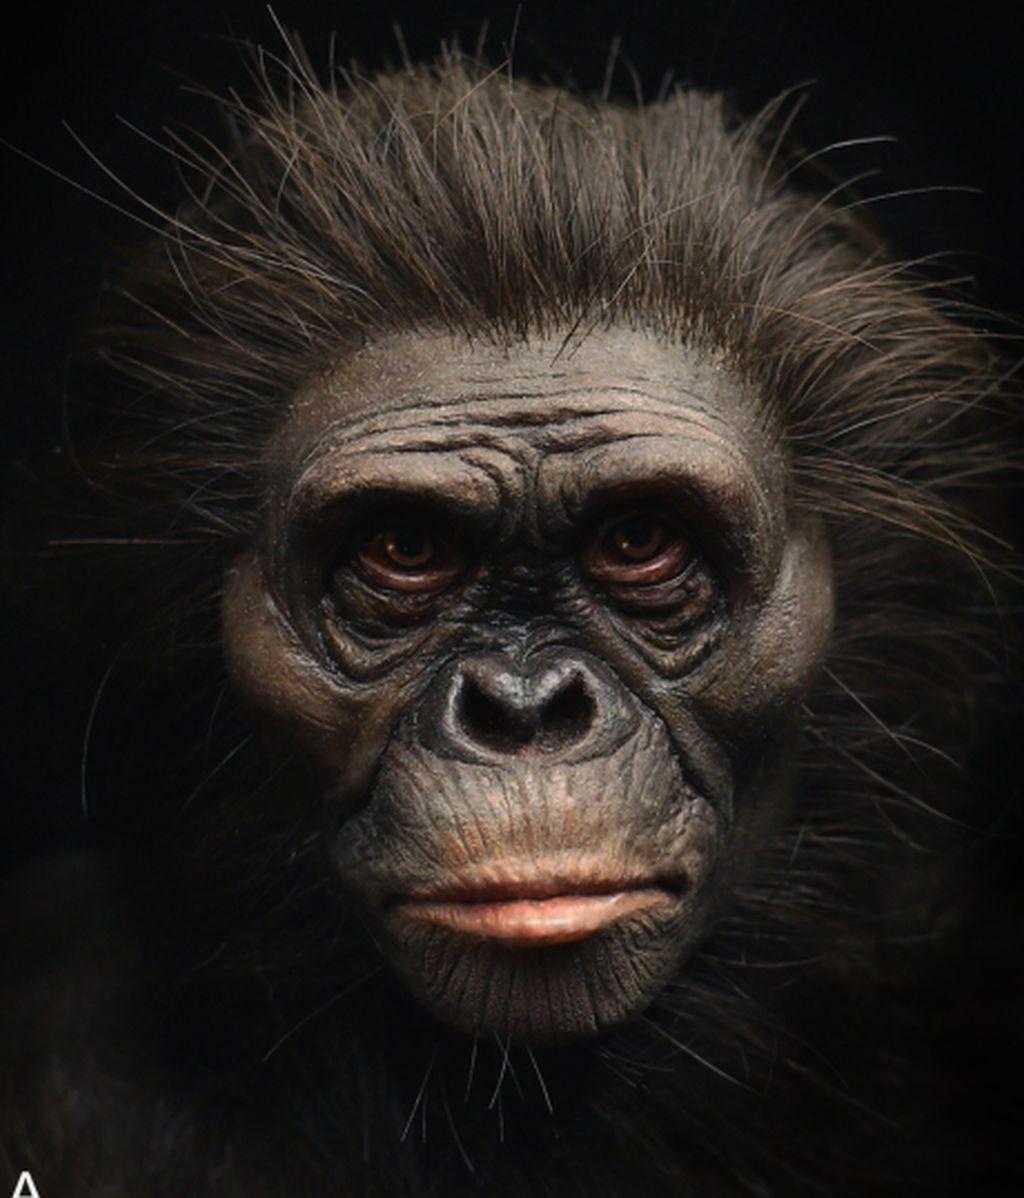 frontiers-ecology-evolution-hominin-evolution-soft-tissue-reconstruction-10-1